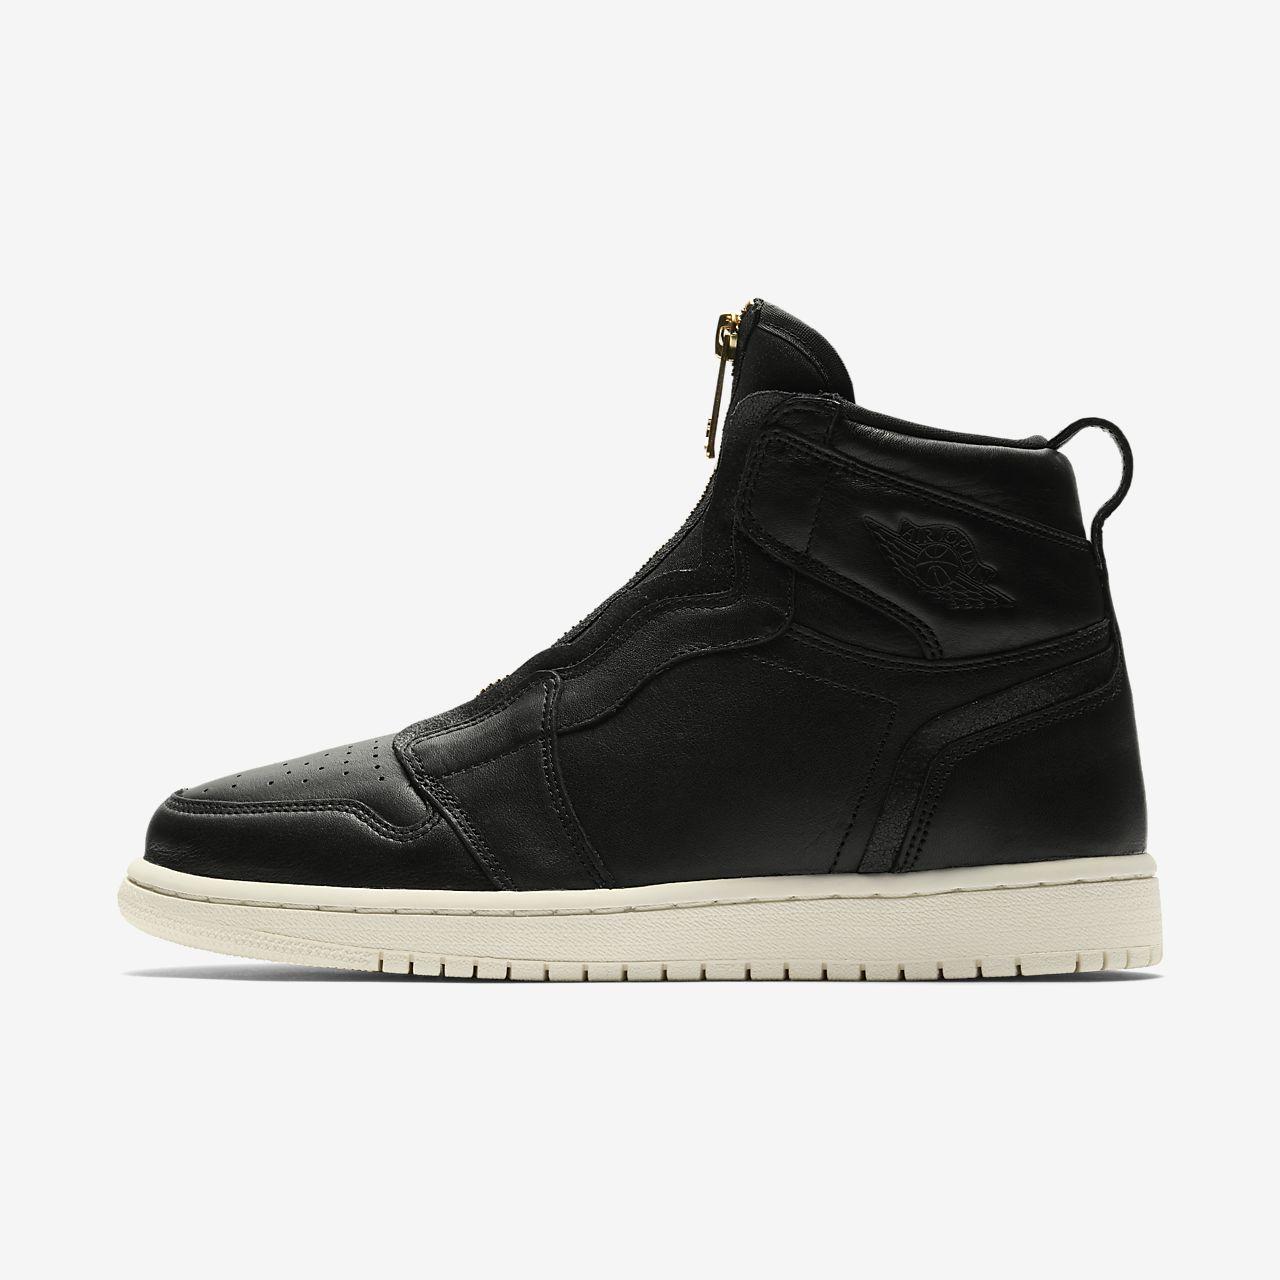 save off bb7a5 7d14c Air Jordan 1 High Zip damesko. Nike.com NO